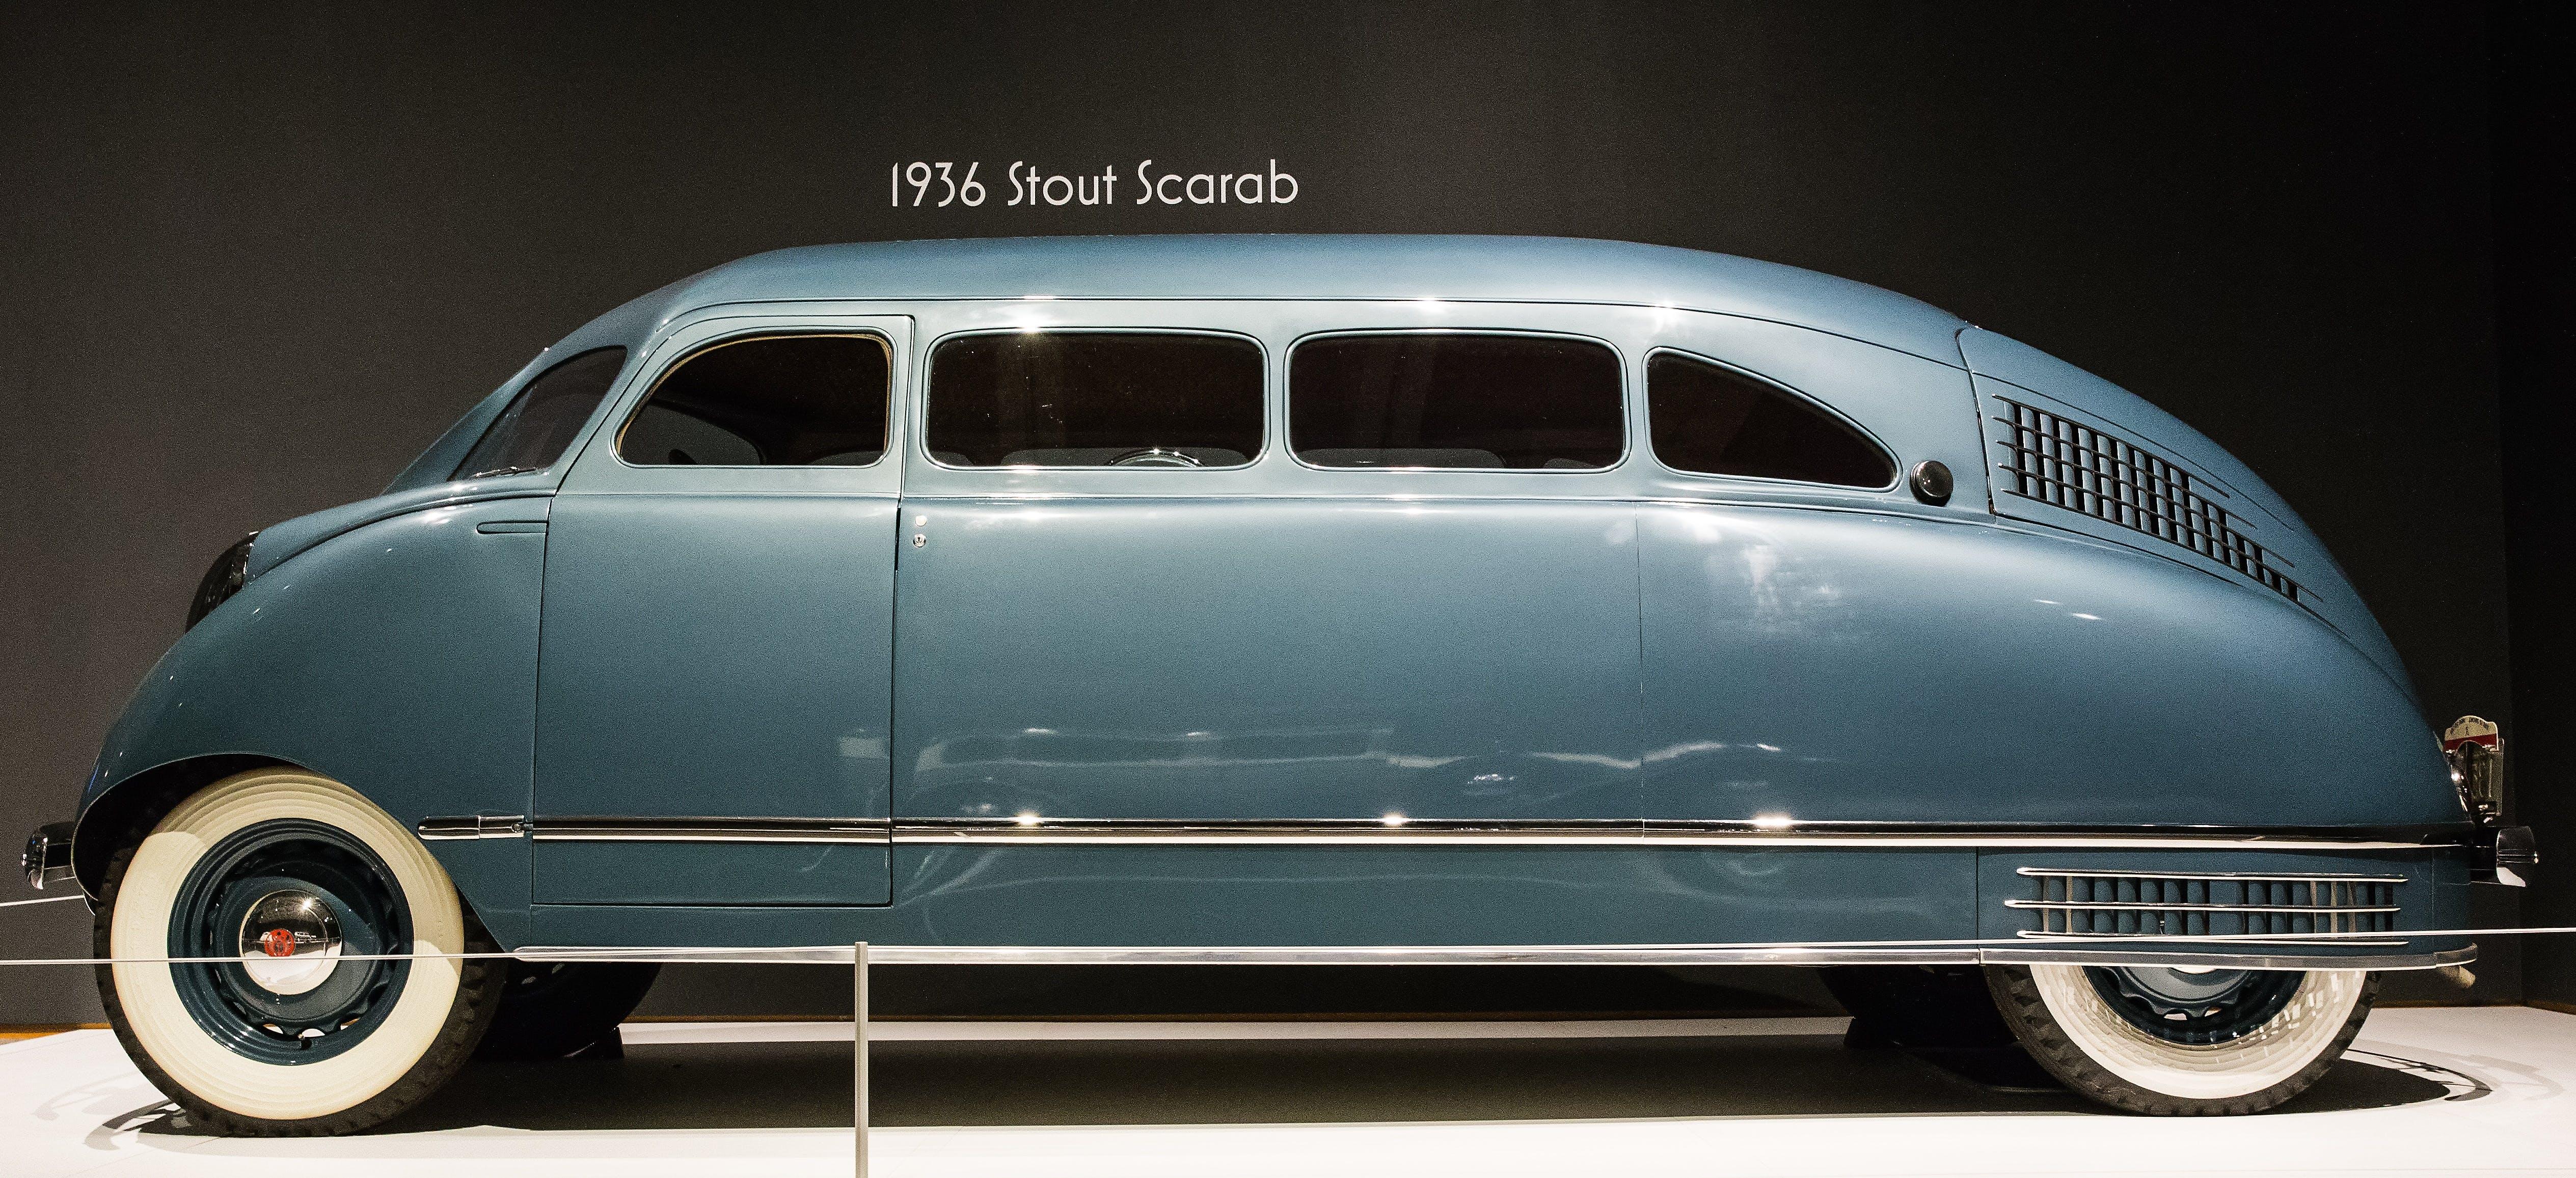 Kostenloses Stock Foto zu 1936 stout scarabäus, auto, automobil, chrom